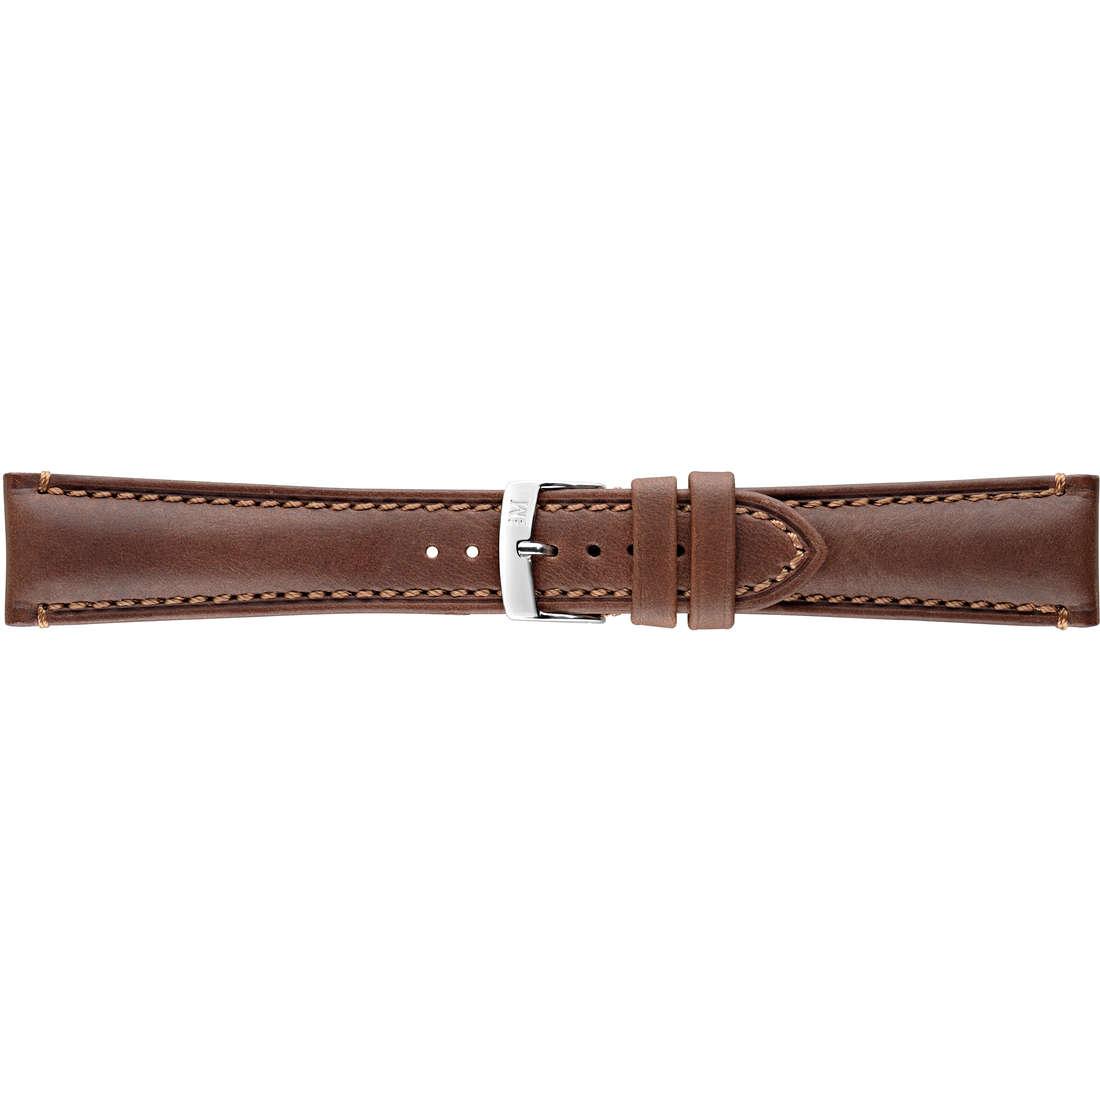 watch watch bands watch straps man Morellato Manufatti A01X4434B09032CR20